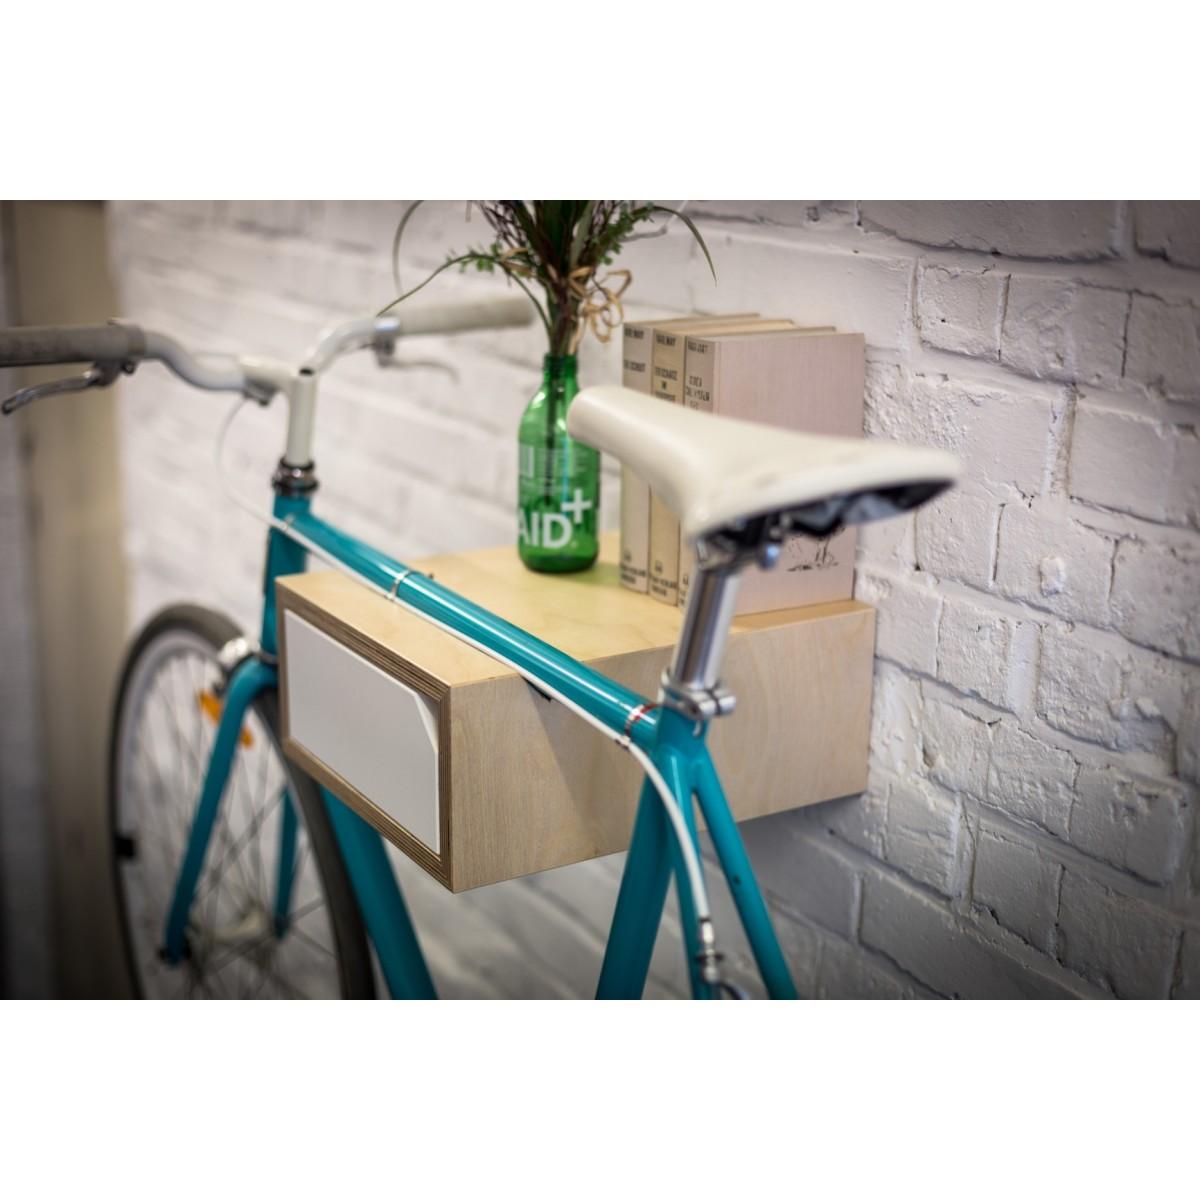 JAKOB | Fahrrad Wandhalterung aus Holz | Fahrradwandhalter  | Bicycledudes